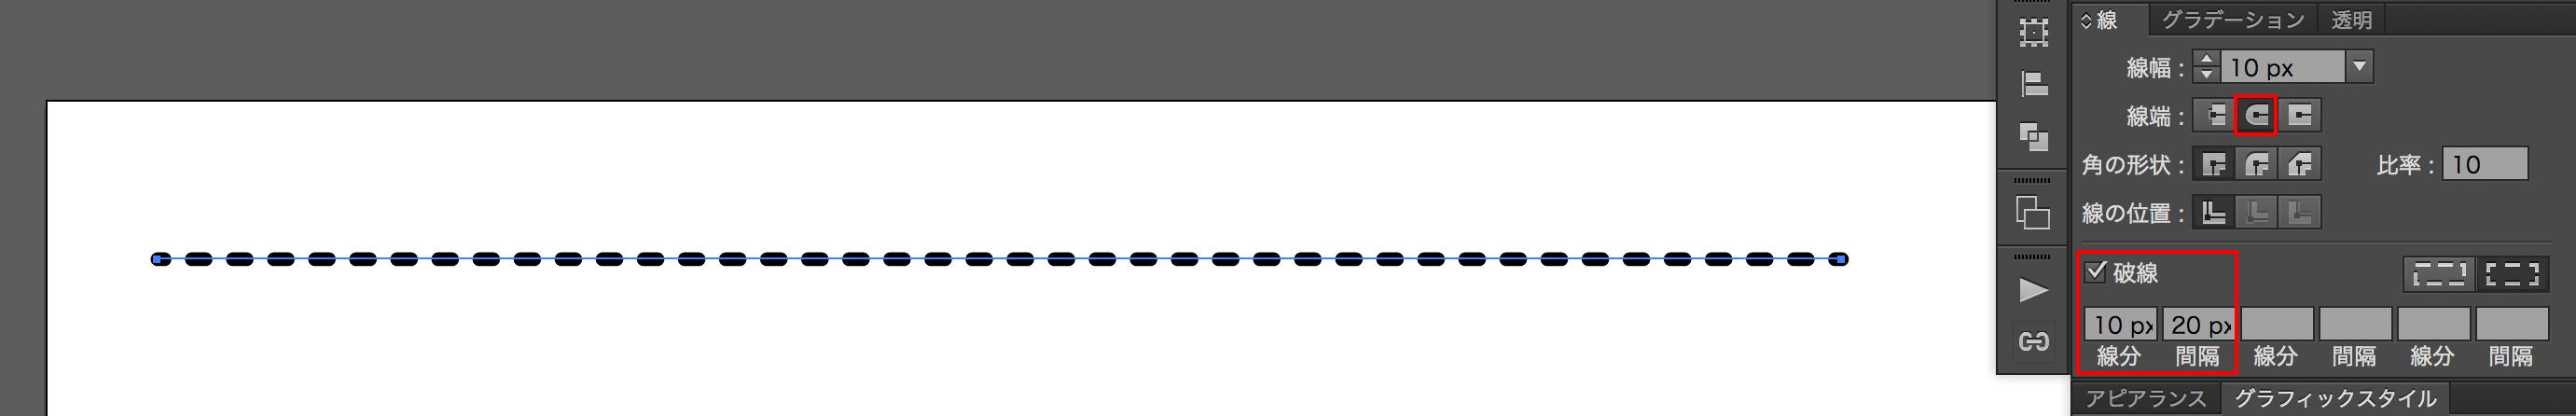 【Illustrator編】手書き風のラフでランダムなかわいい点線・破線を作る方法